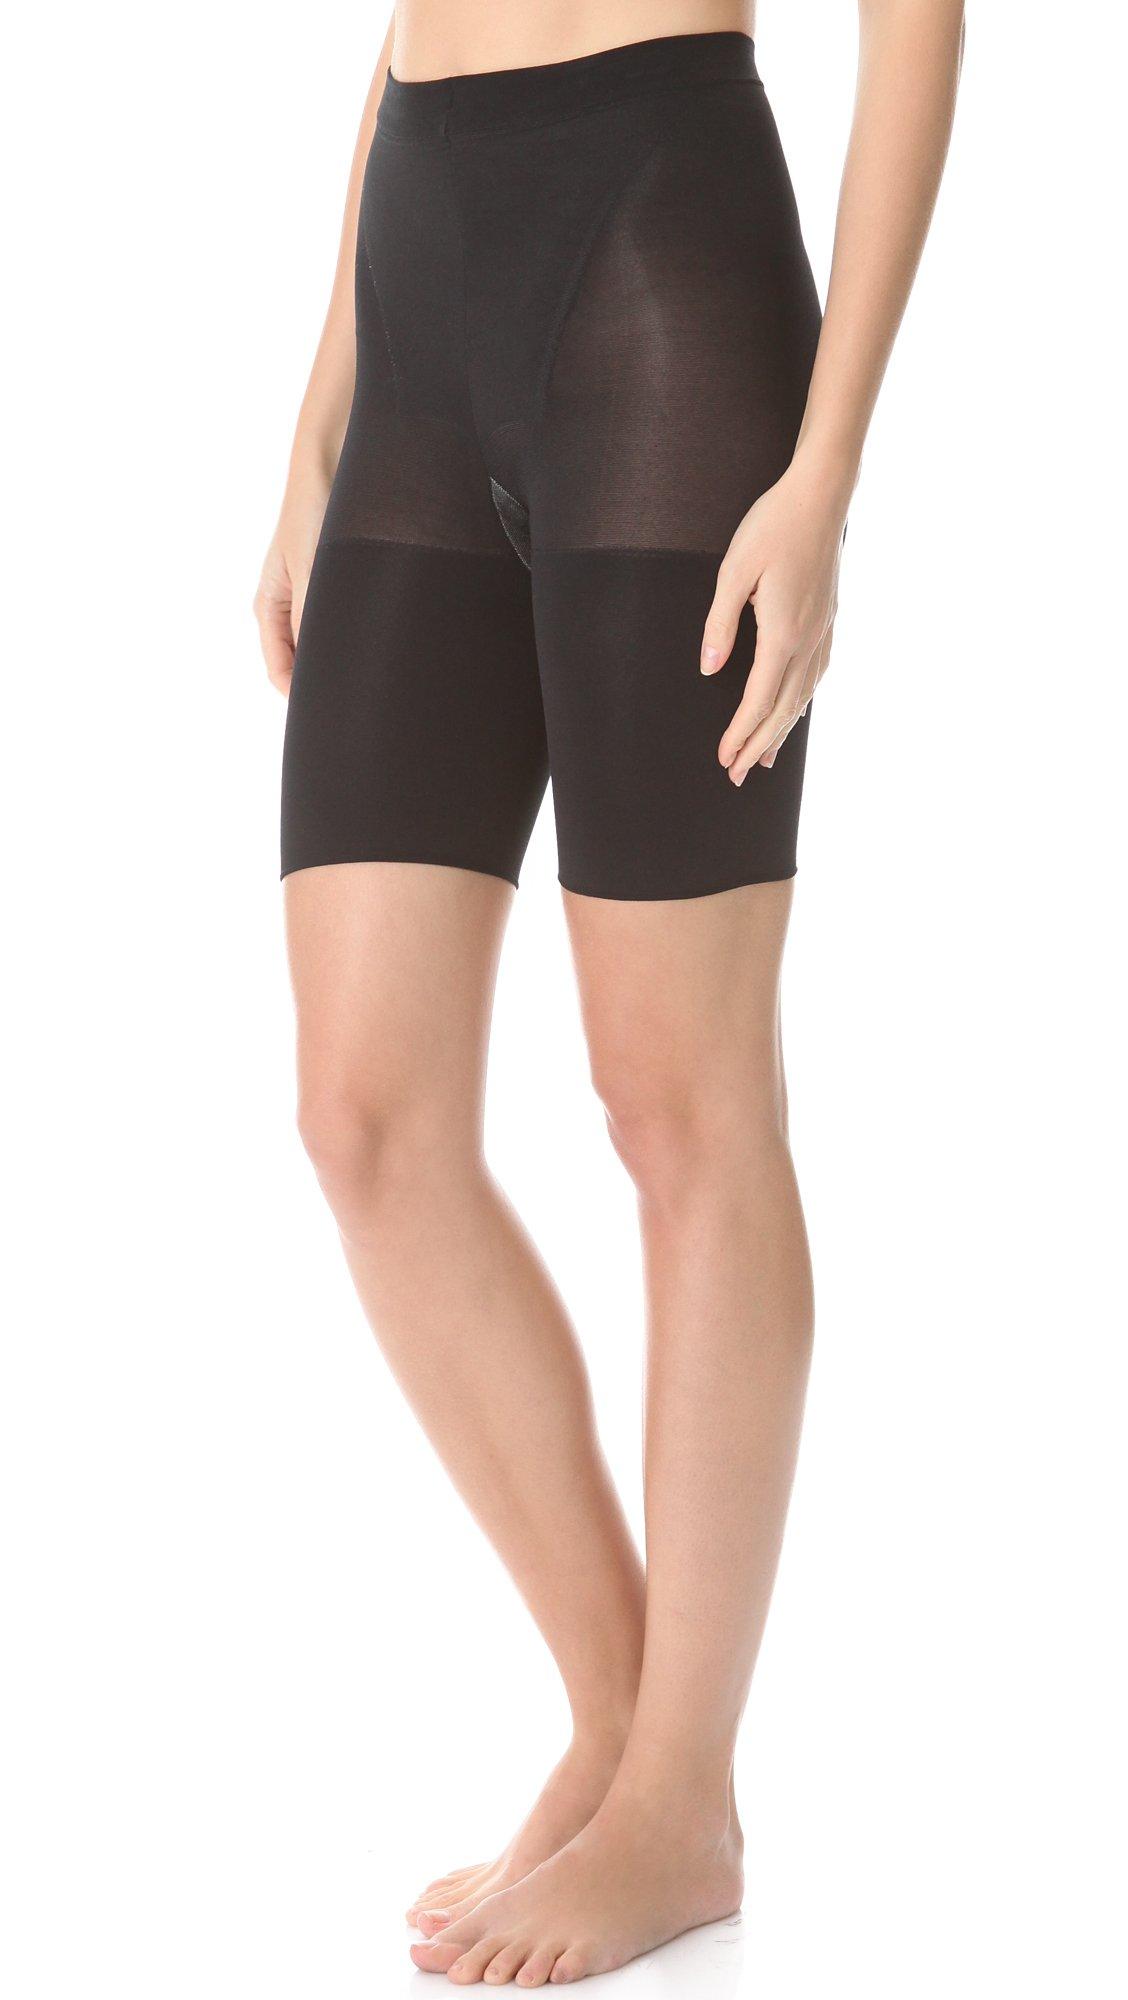 SPANX Women's (tm) Line Super Power Panties